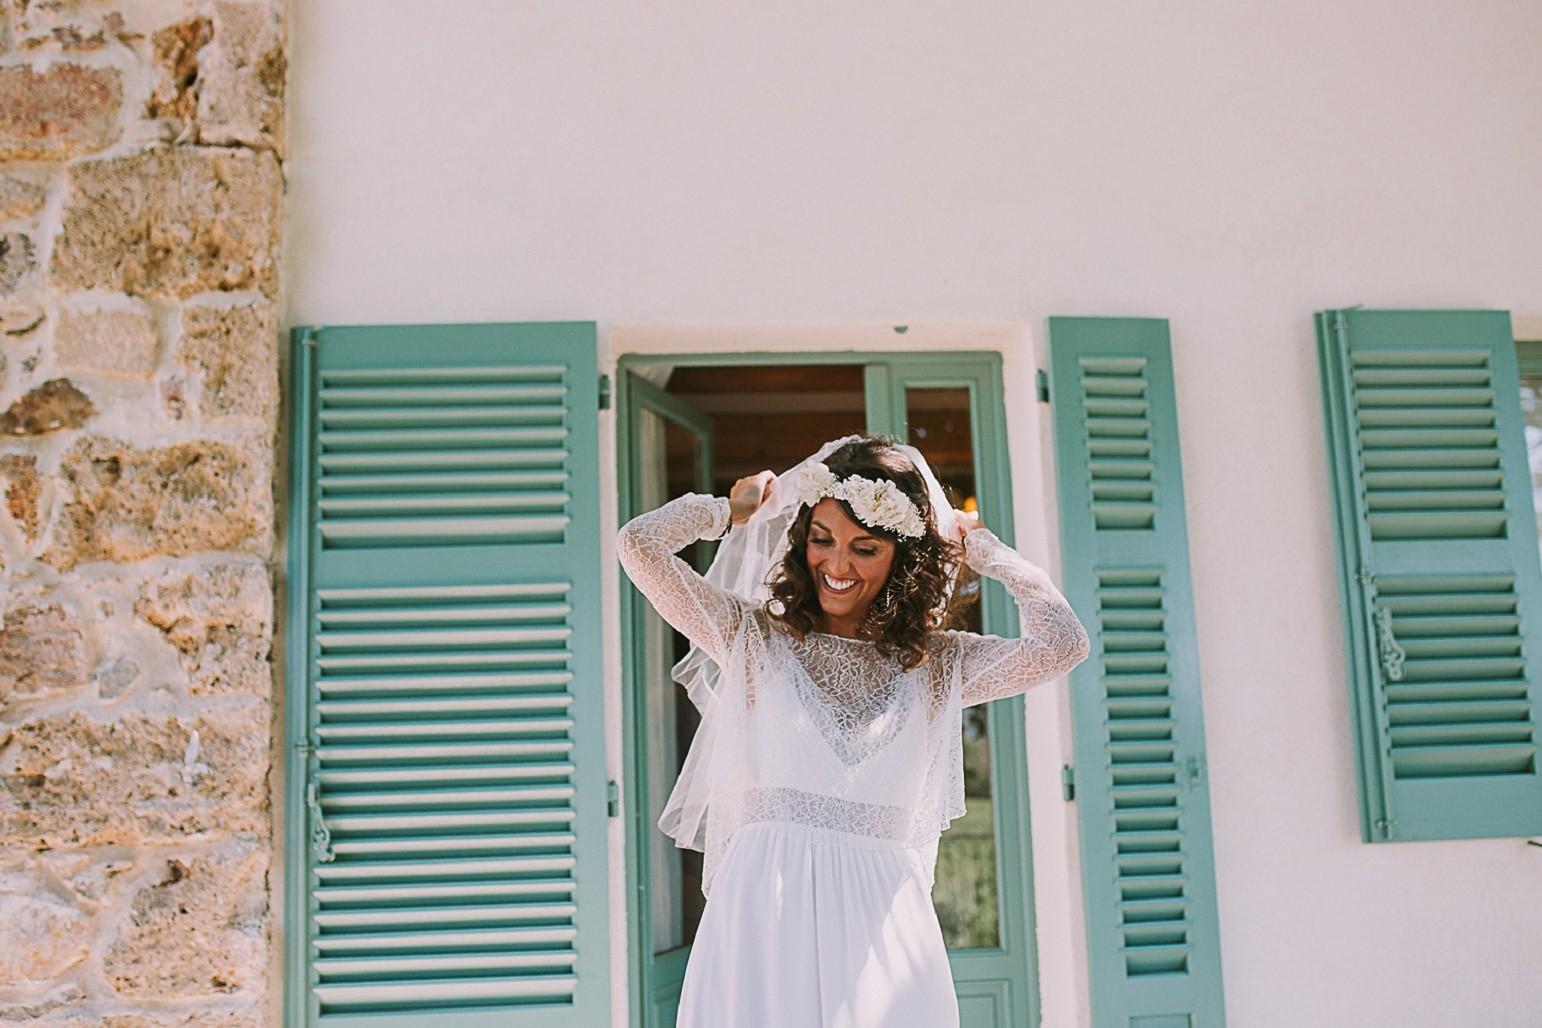 kateryna-photos-mariage-photographe-chateau-maime-aix-nice-provence-wedding-arcs-sur-argens_rime-arodaky-dress